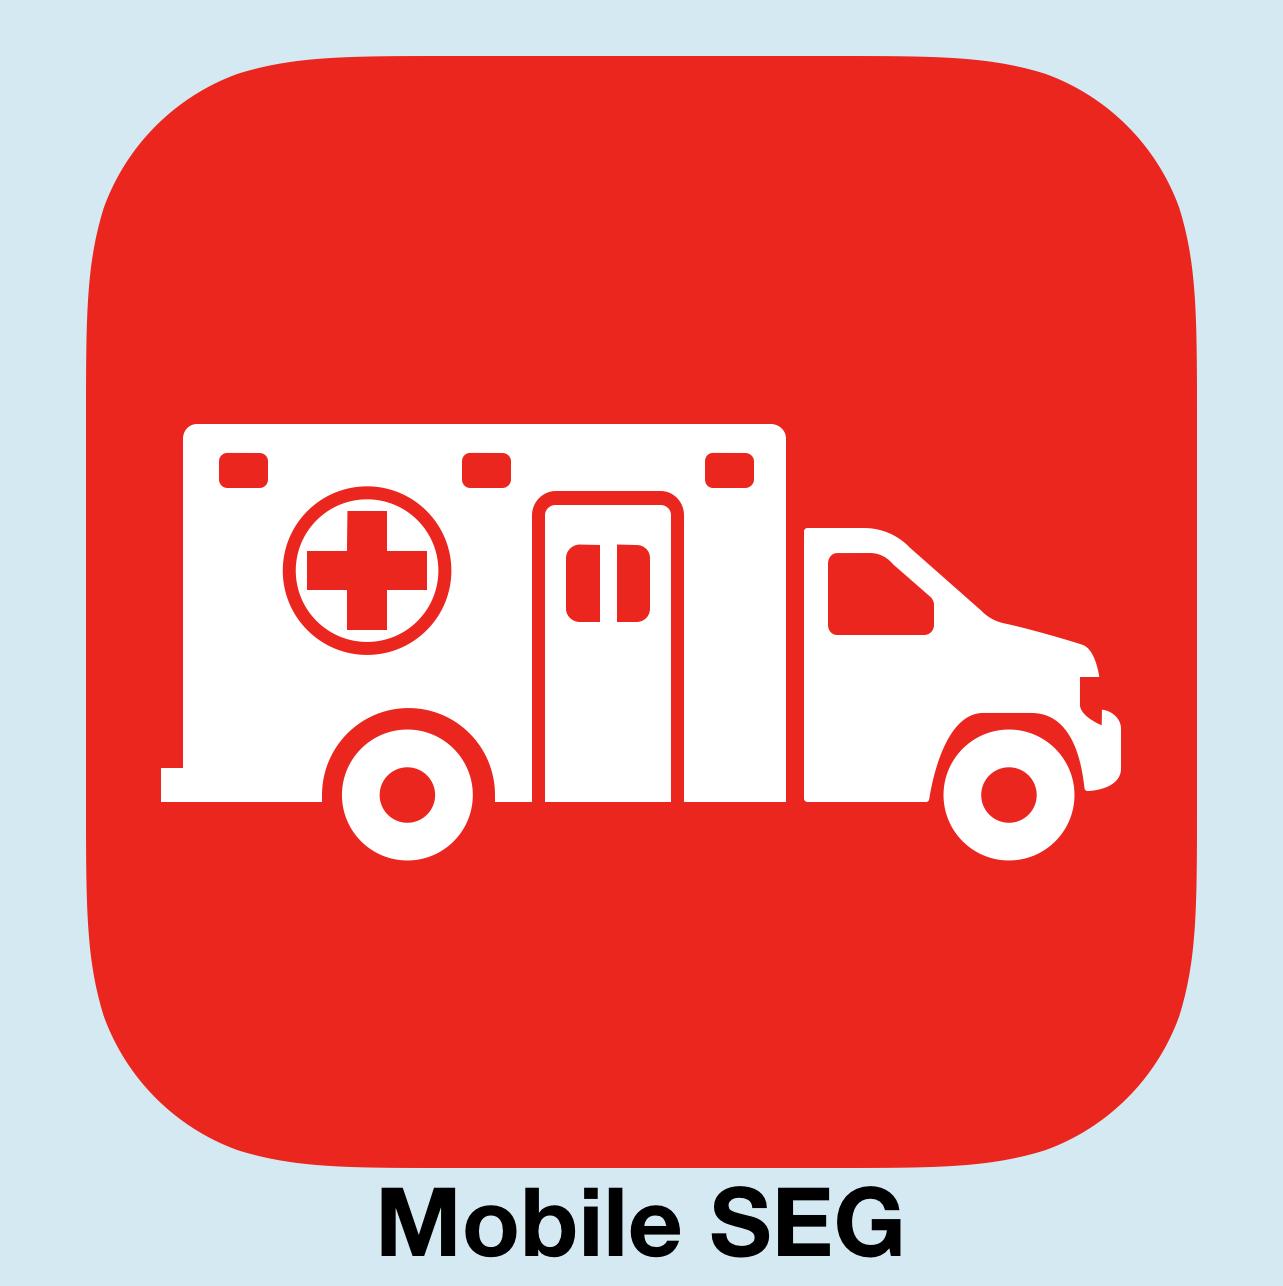 mobile SEG